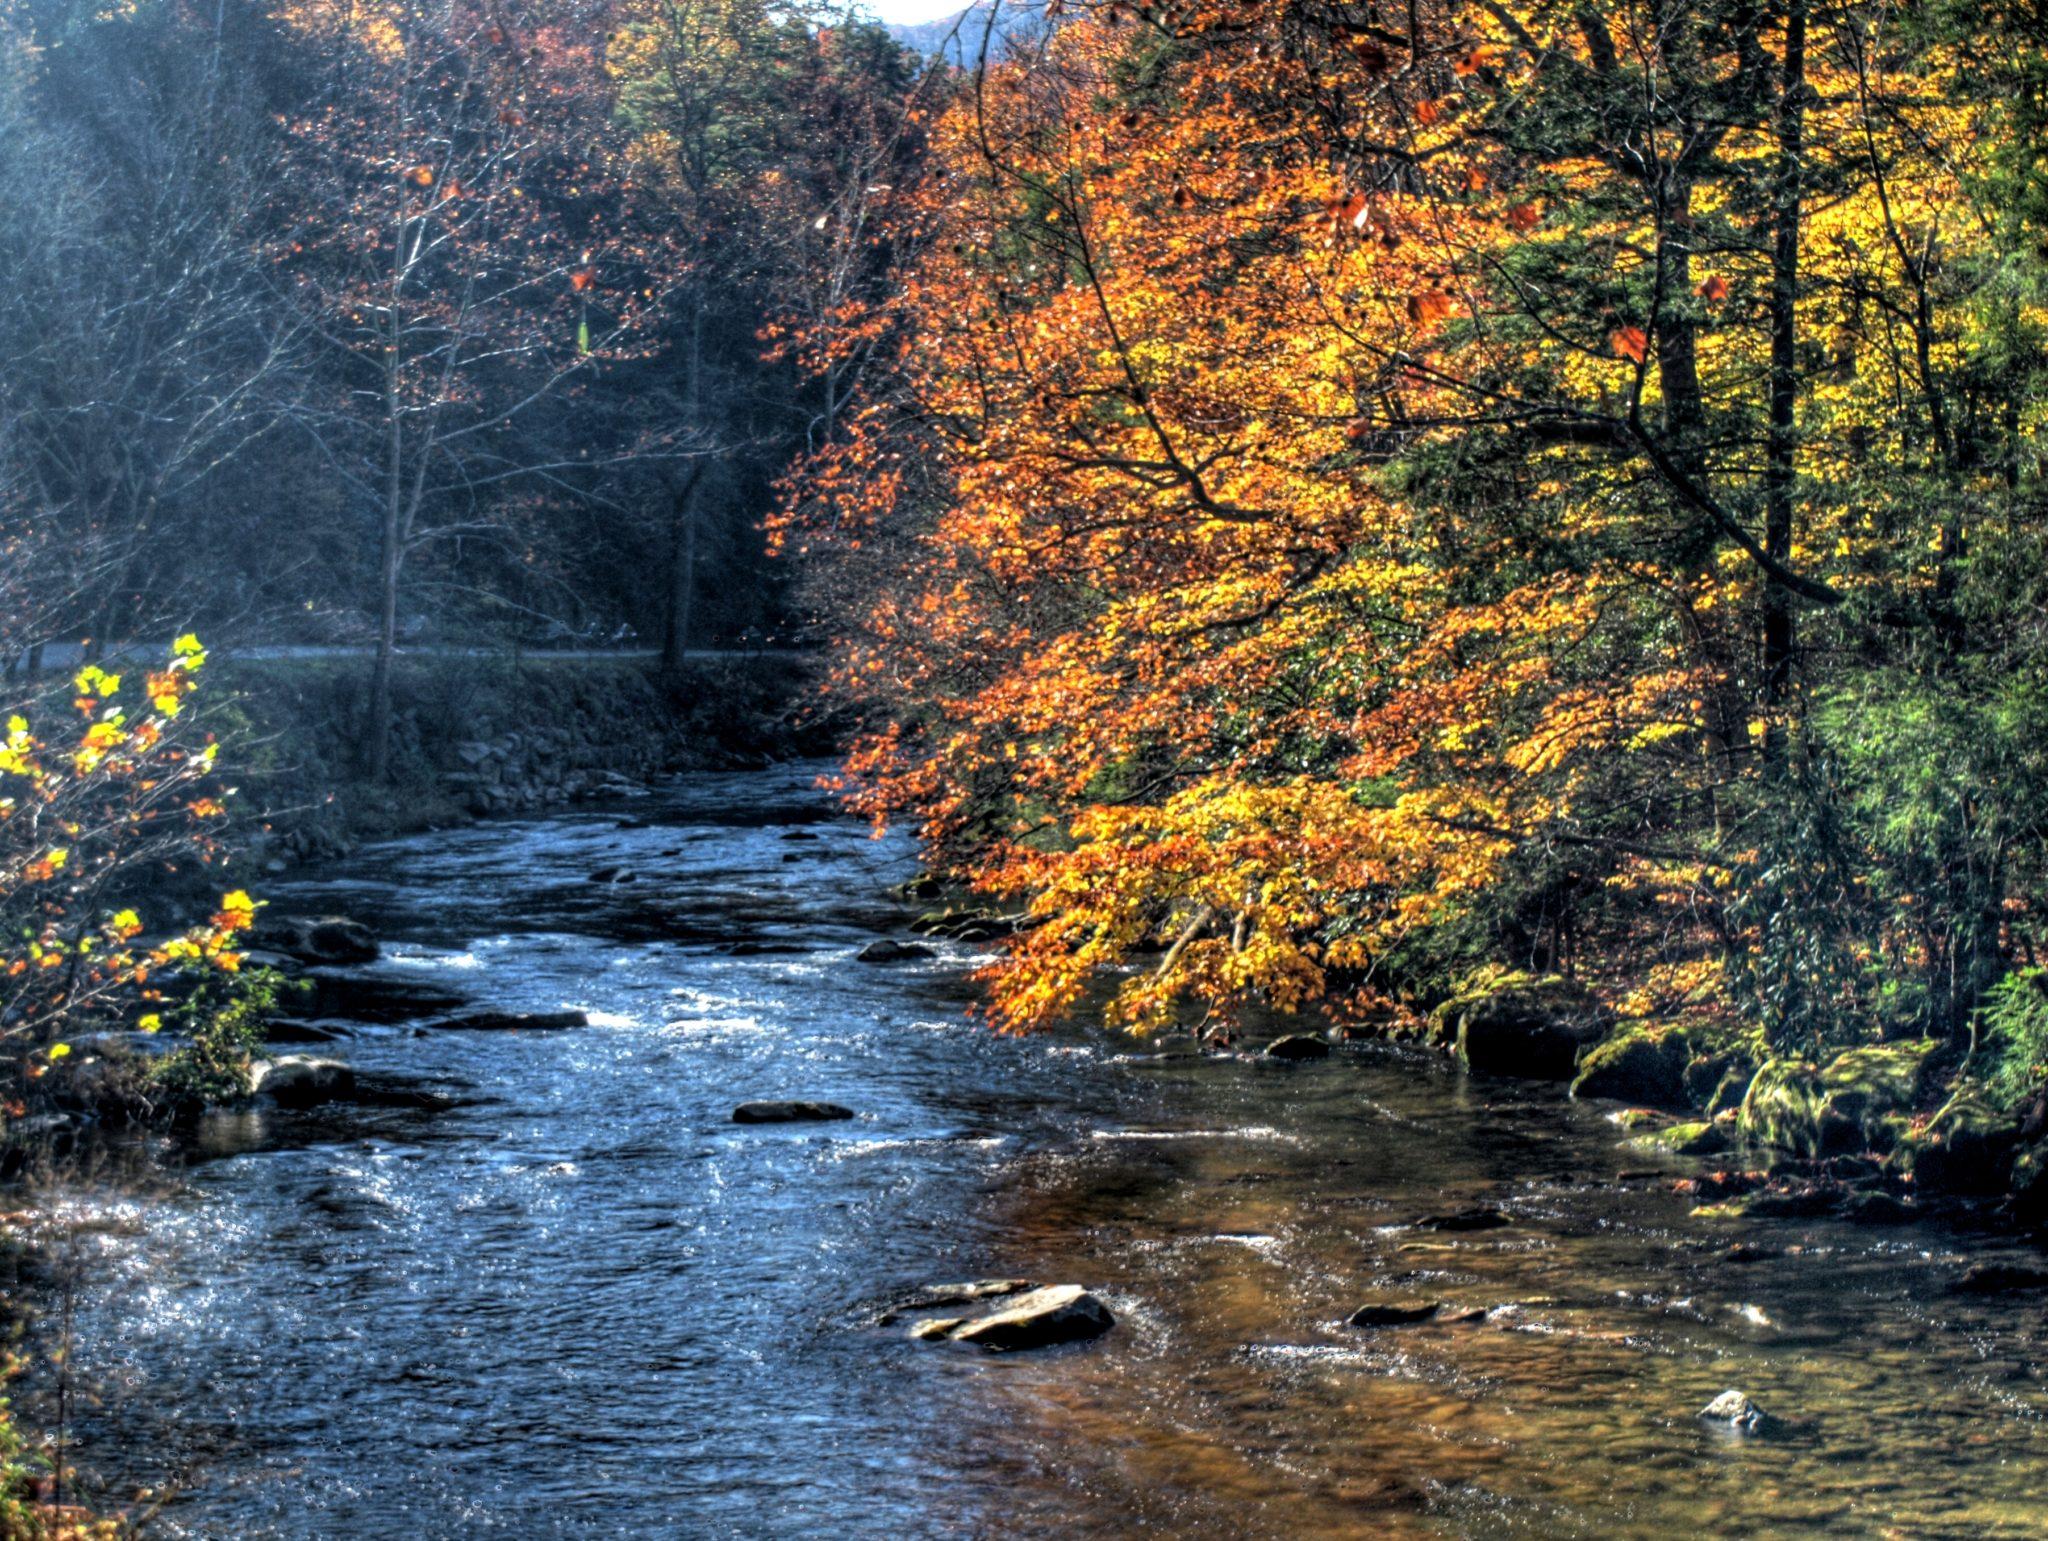 Mountain Stream in October